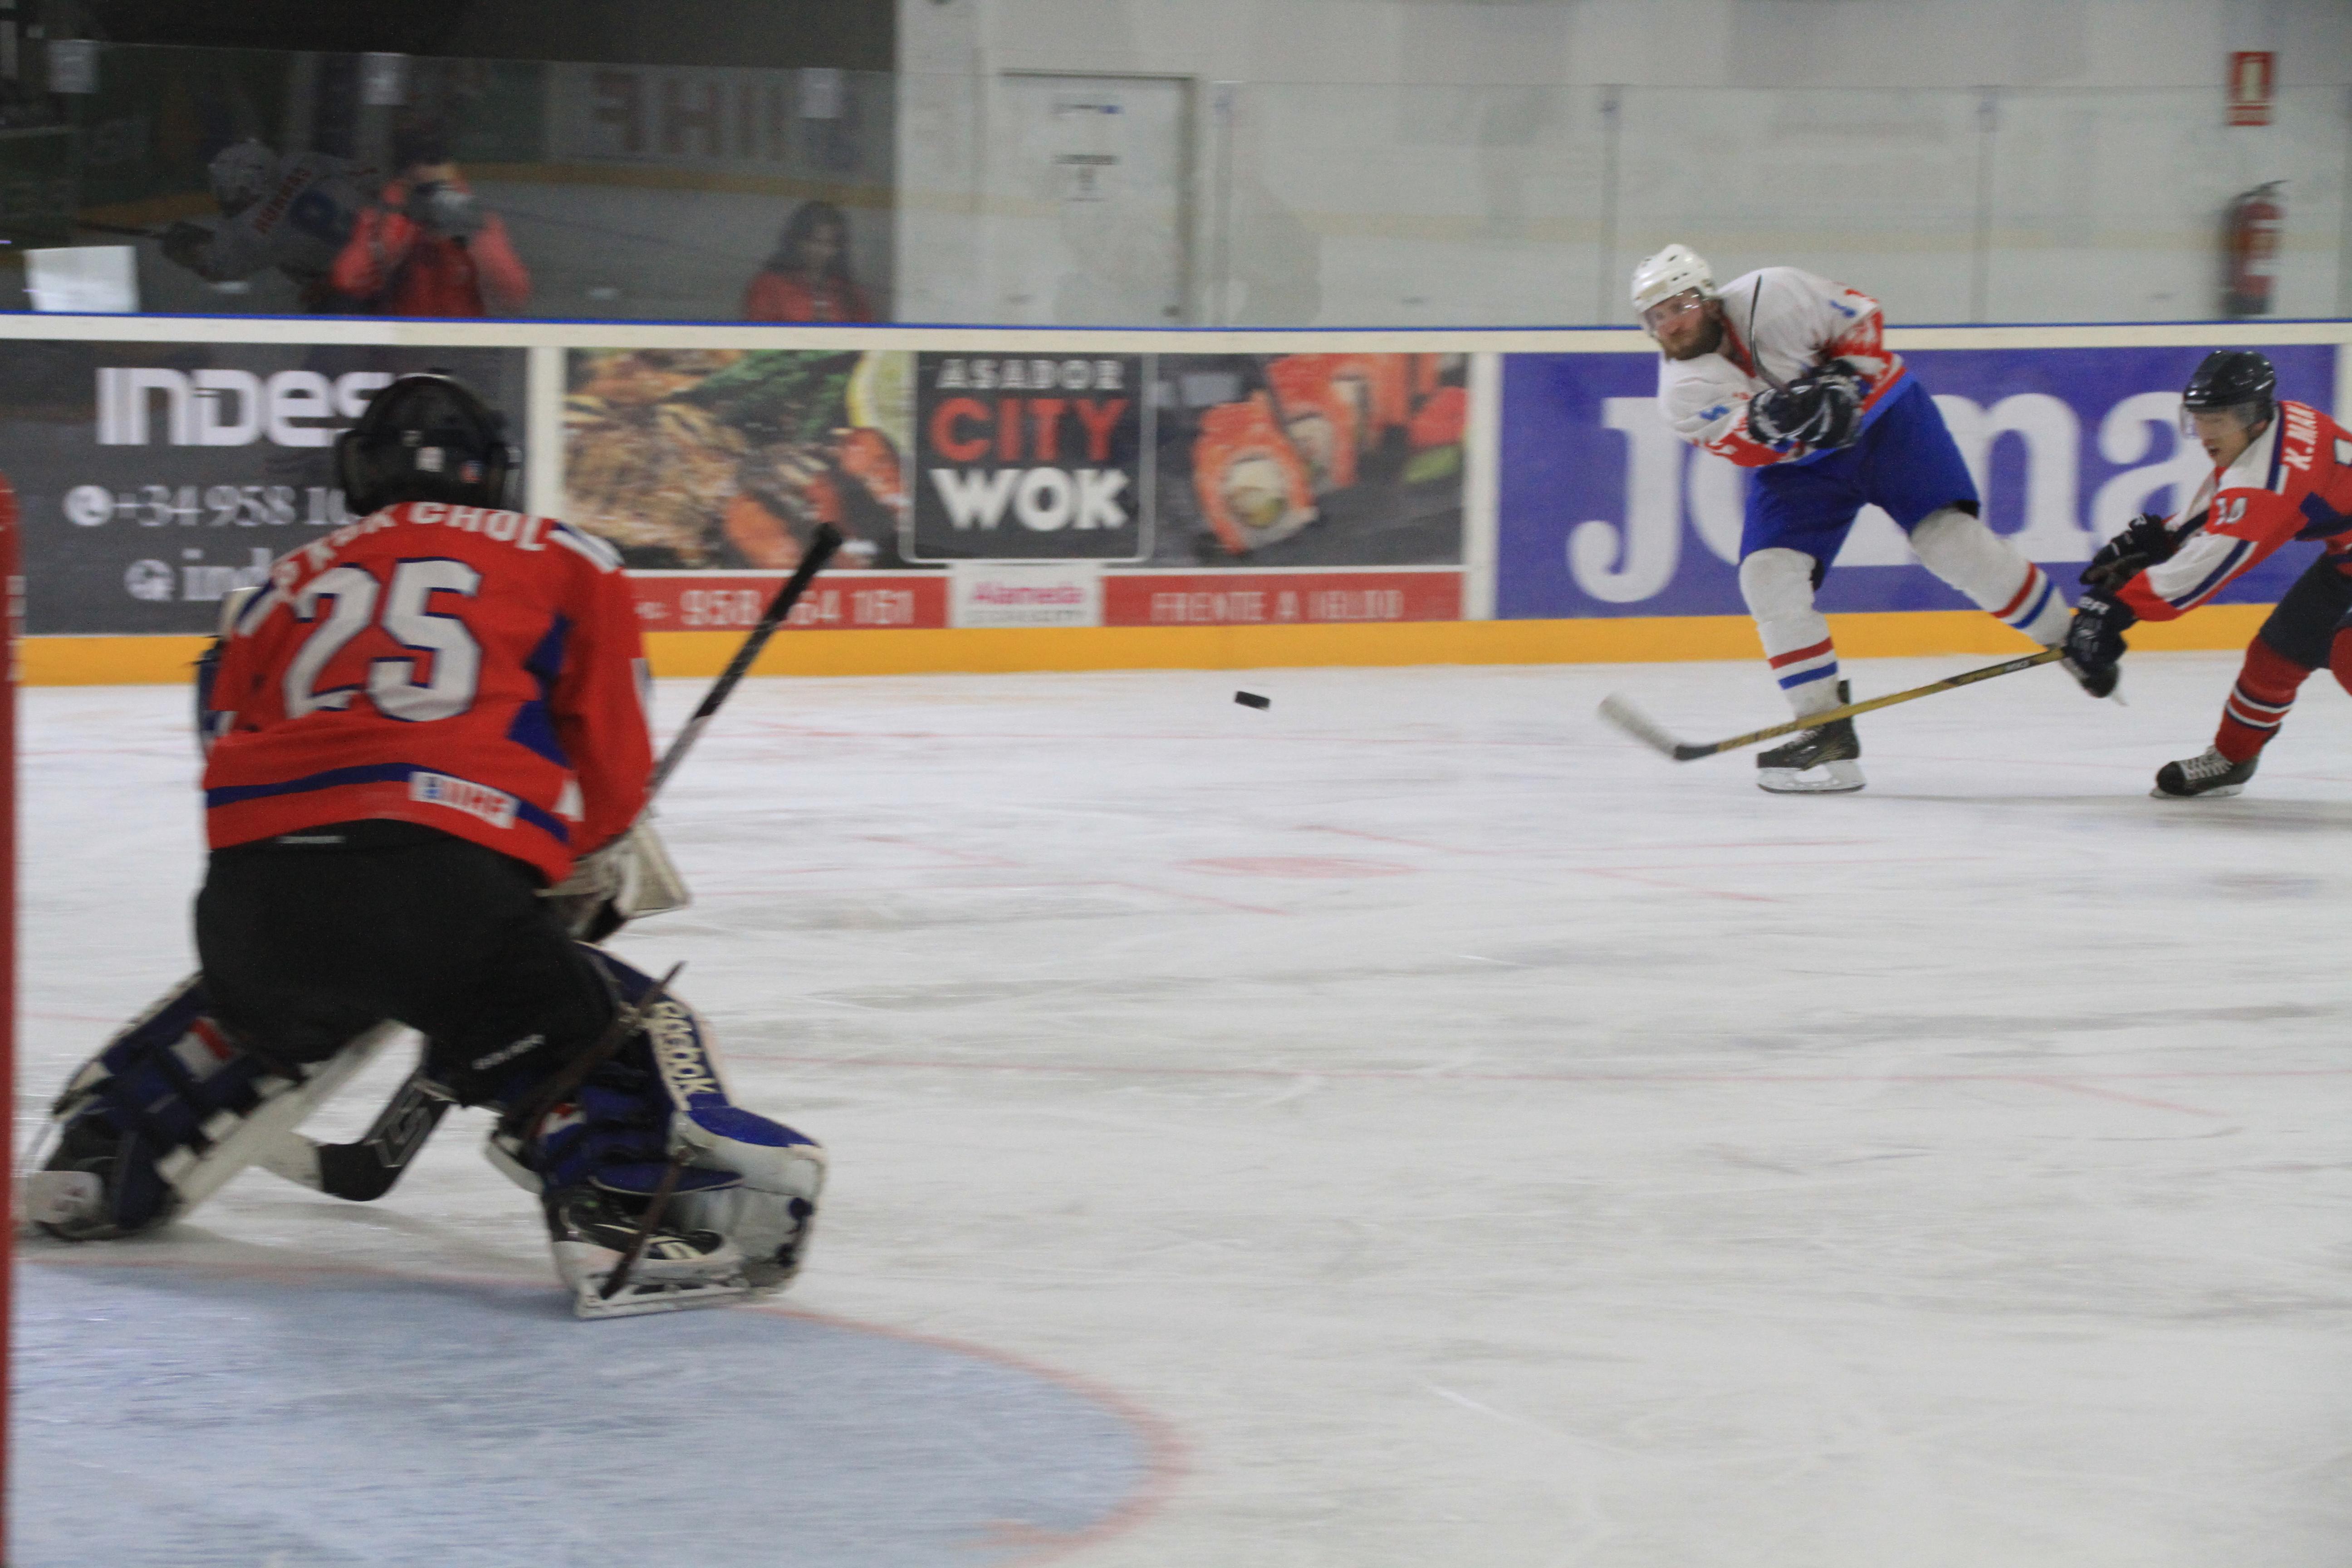 Painful victory for Team Luxembourg./Schmäerzhaft Victoire fir Team Lëtzebuerg./Une victoire douloureuse pour le Luxembourg.